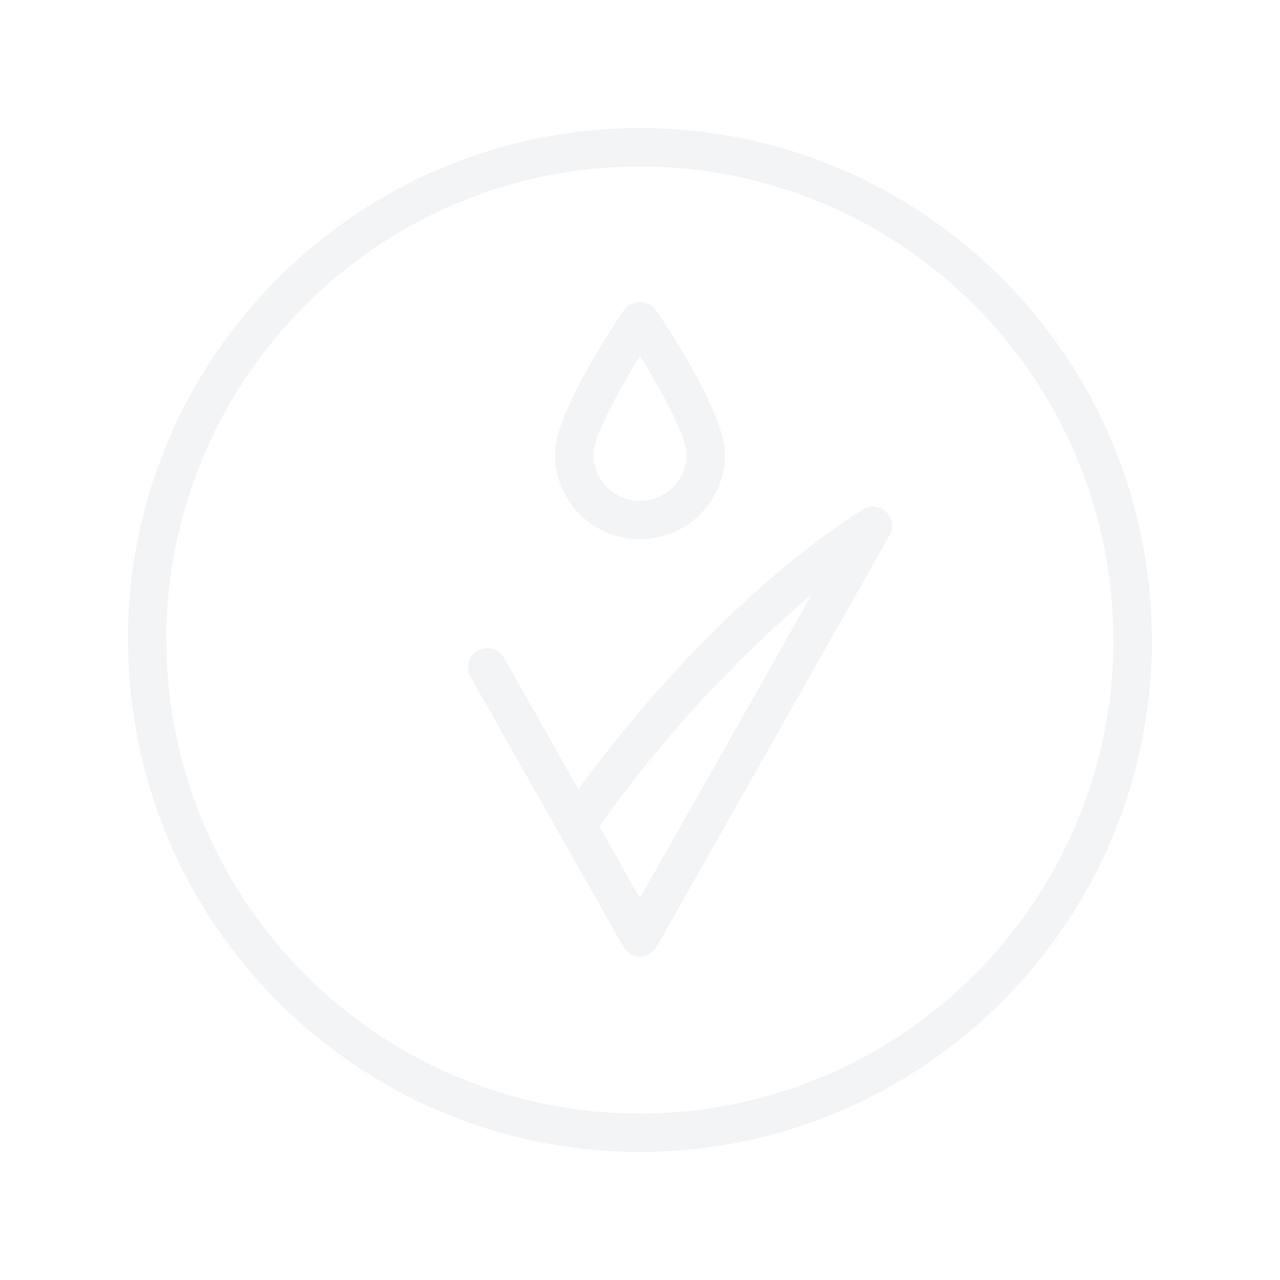 L'Oreal True Match Powder No.1.R/1.C Rose Ivory 9g